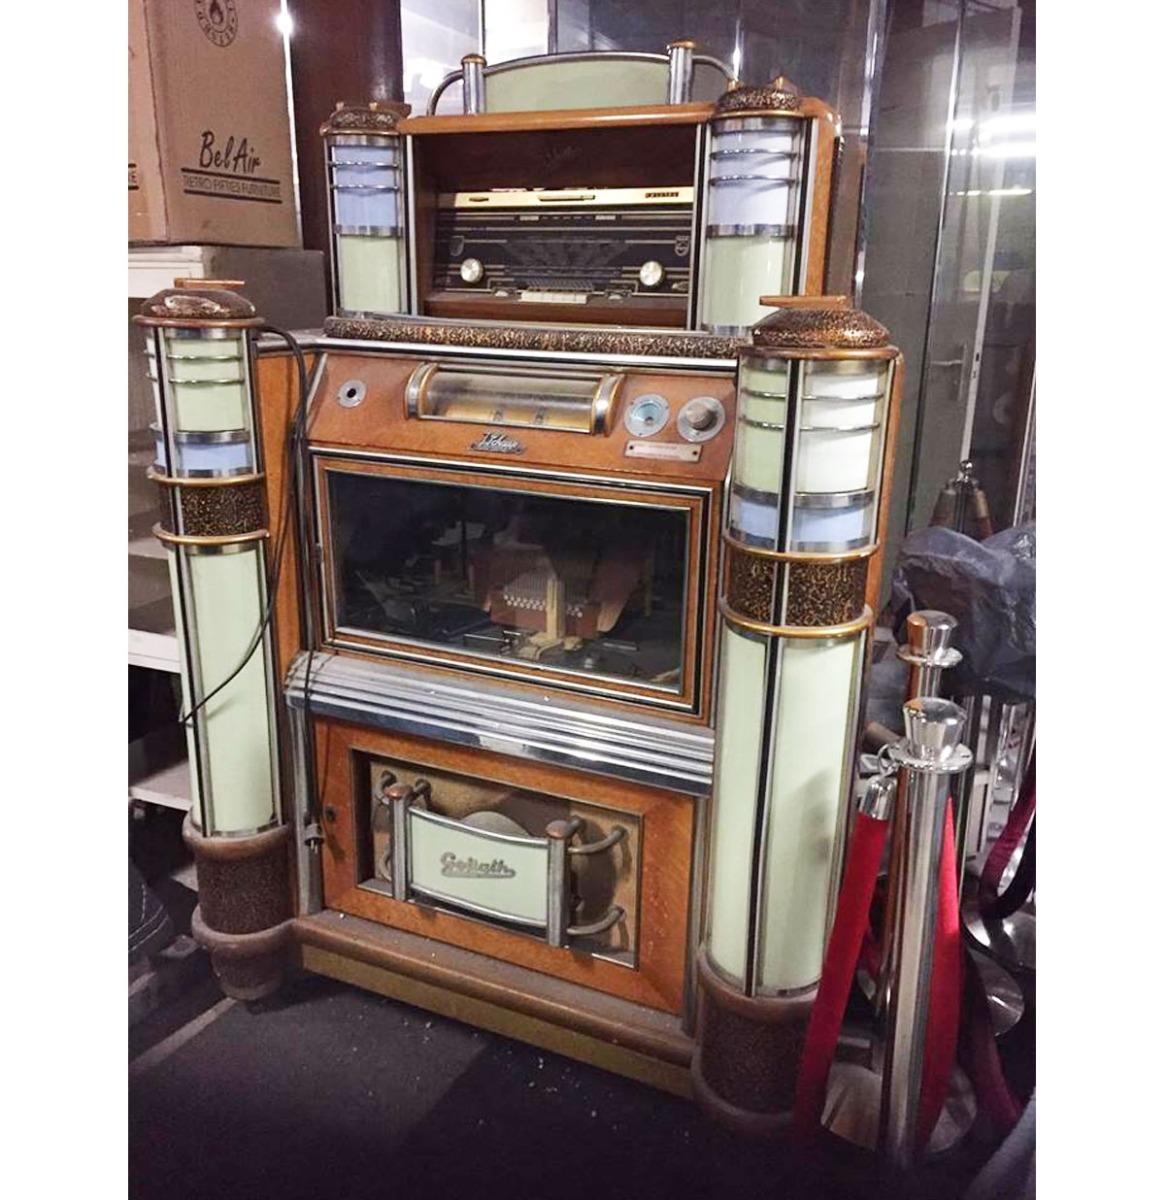 Discophone Goliath Jukebox - Origineel Belgie 1948-56